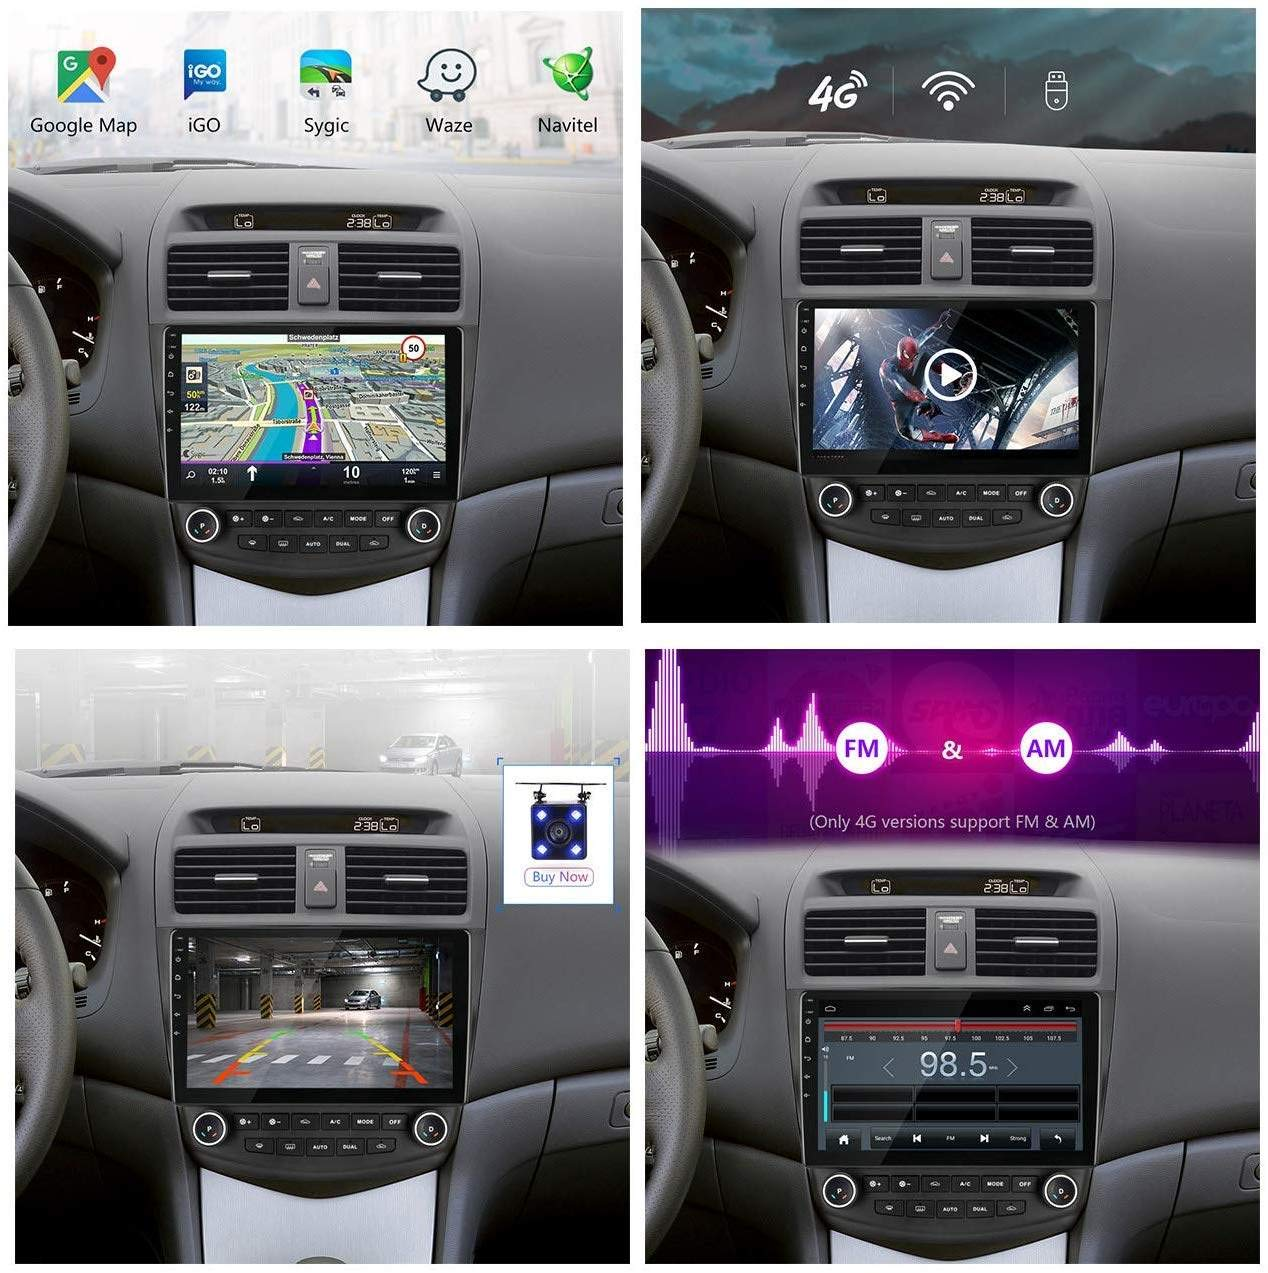 GLFDYC Android 8.1 GPS Navigation Stereo Radio 10 1080P Pantalla T/áctil Completa Reproductor Multimedia Control Volante Hands-Free Calls SWC USB,4Cores:4G+WiFi1G+16G para Honda Accord 7 2005-2008